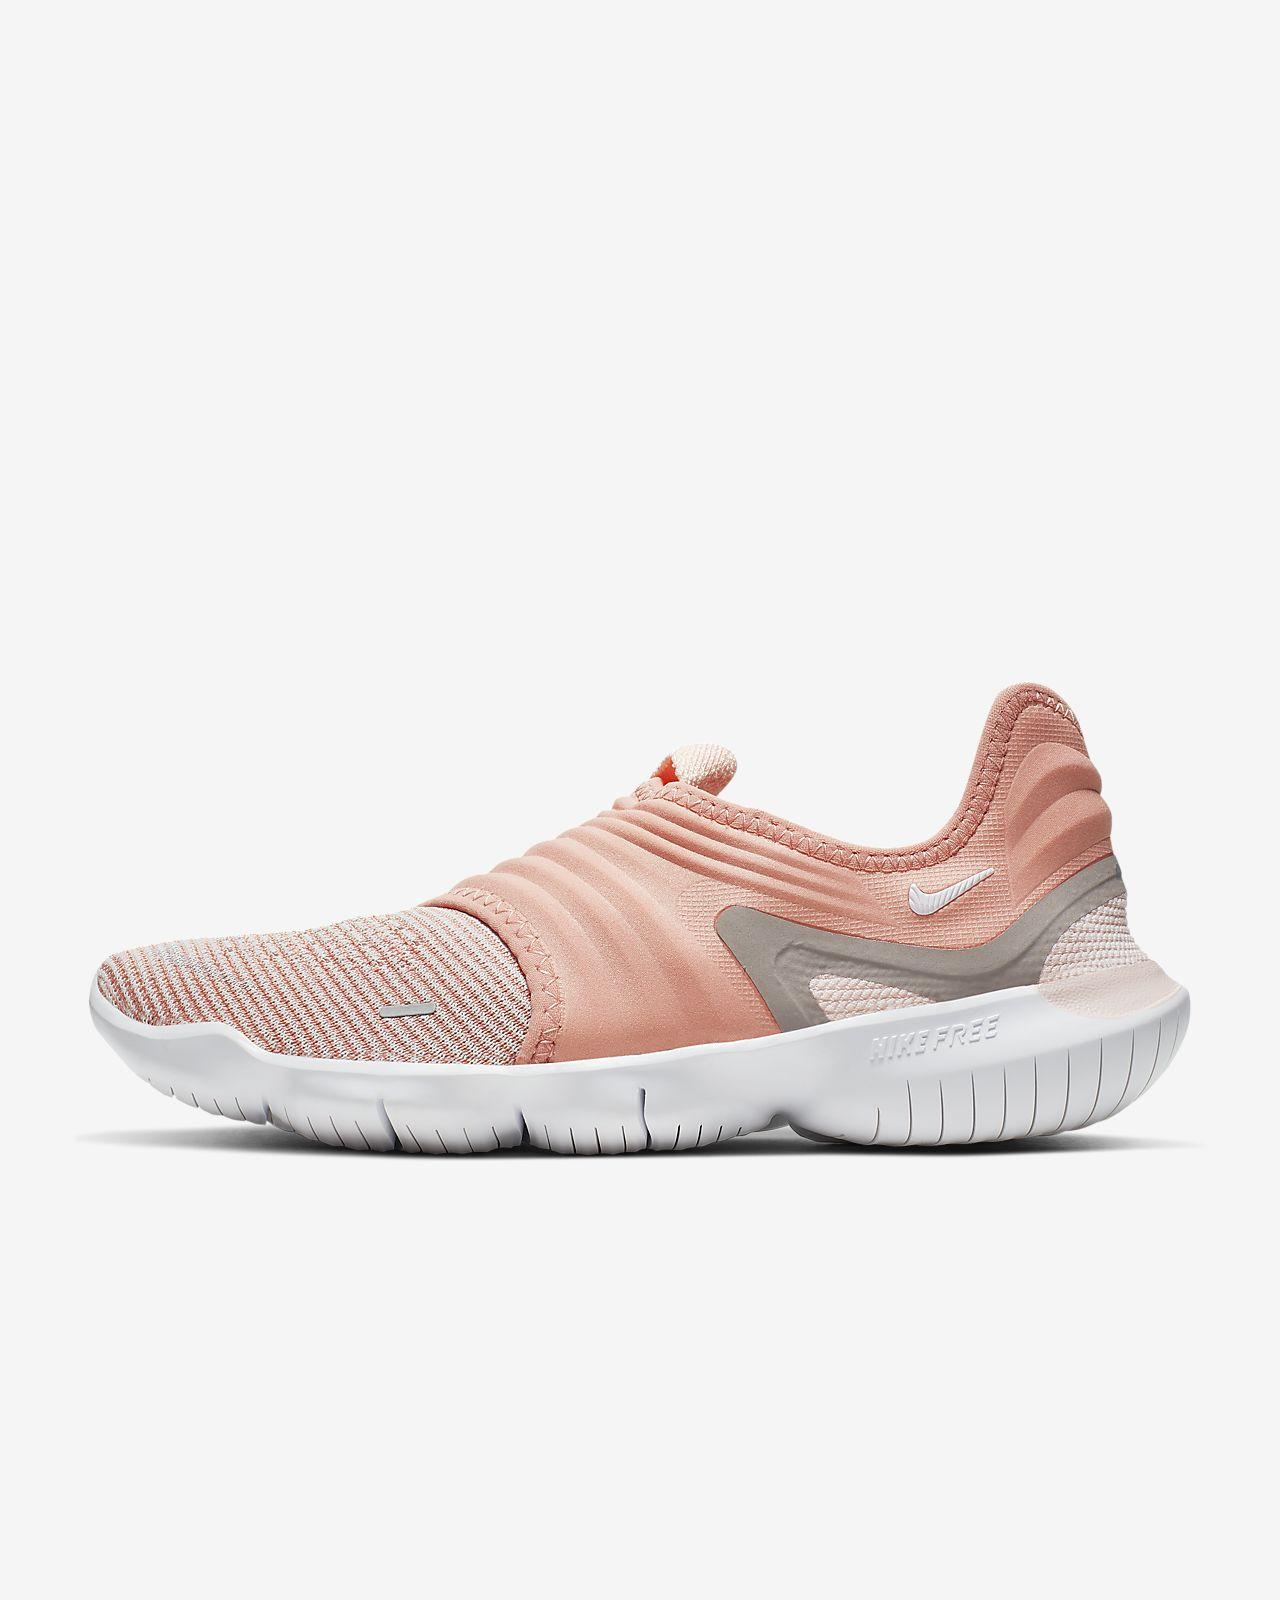 Chaussure de running Nike Free RN Flyknit 3.0 pour Femme